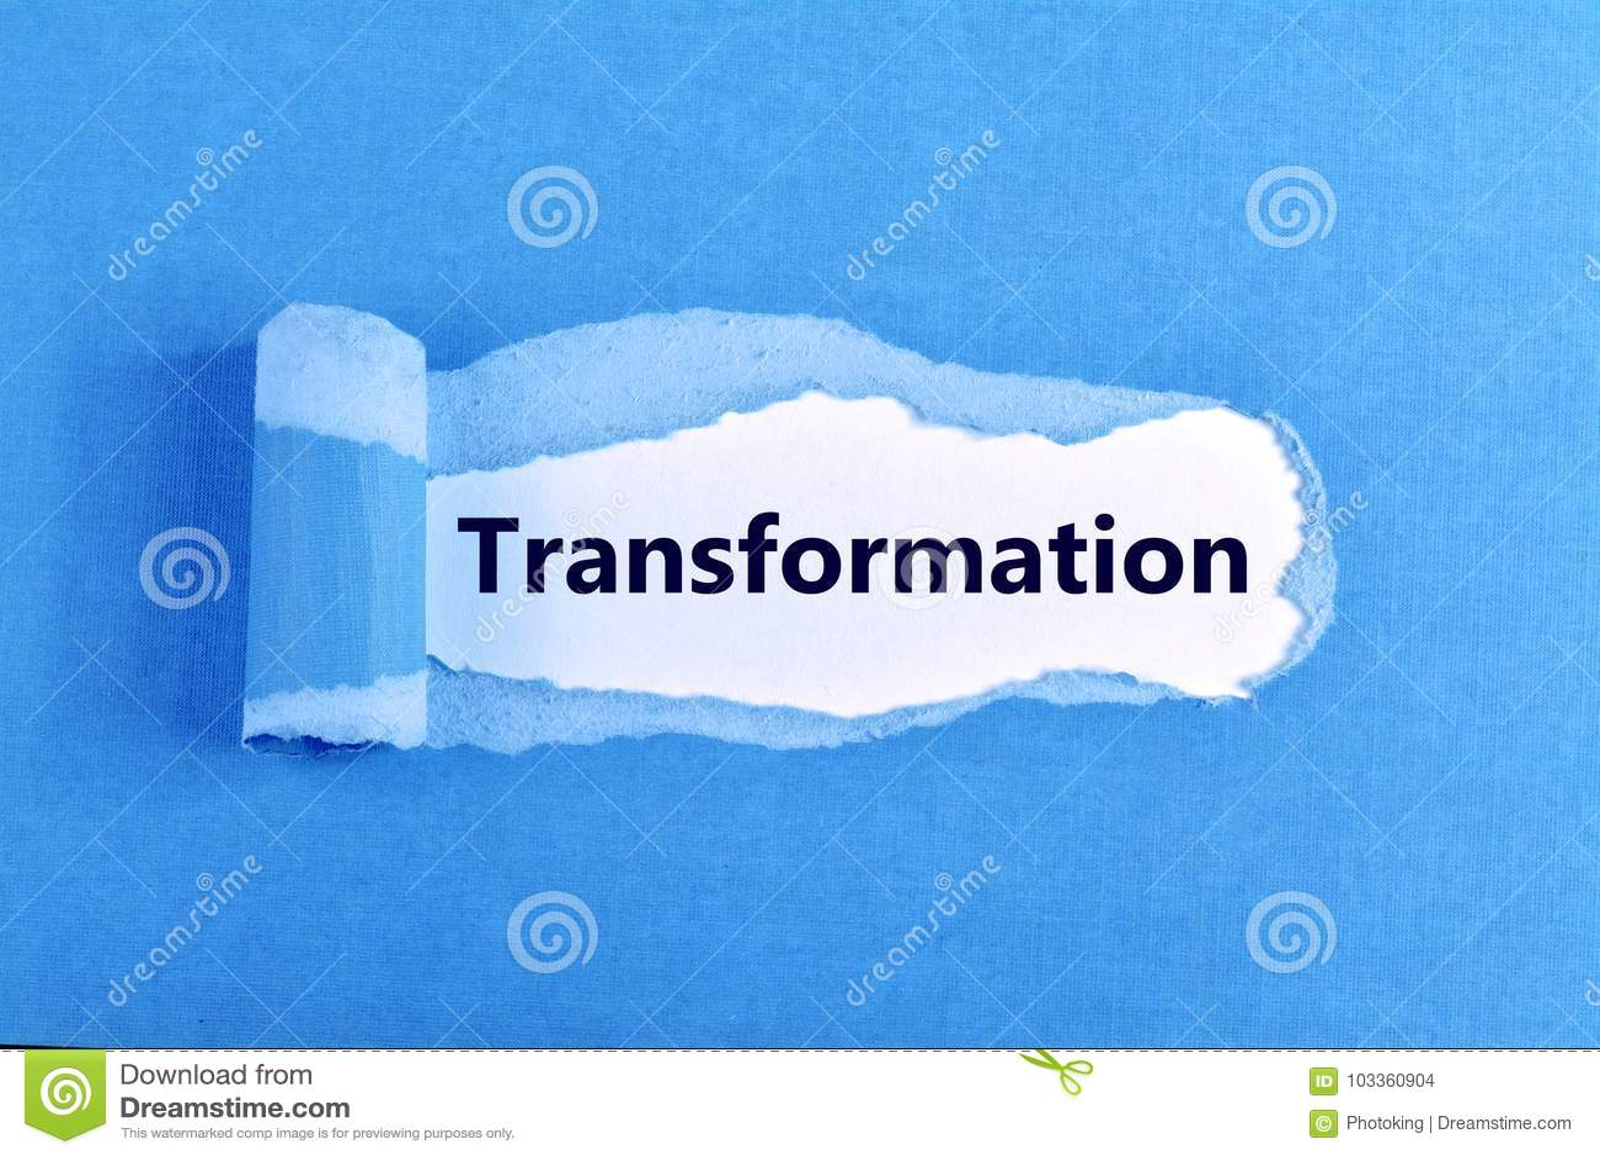 Transformation word